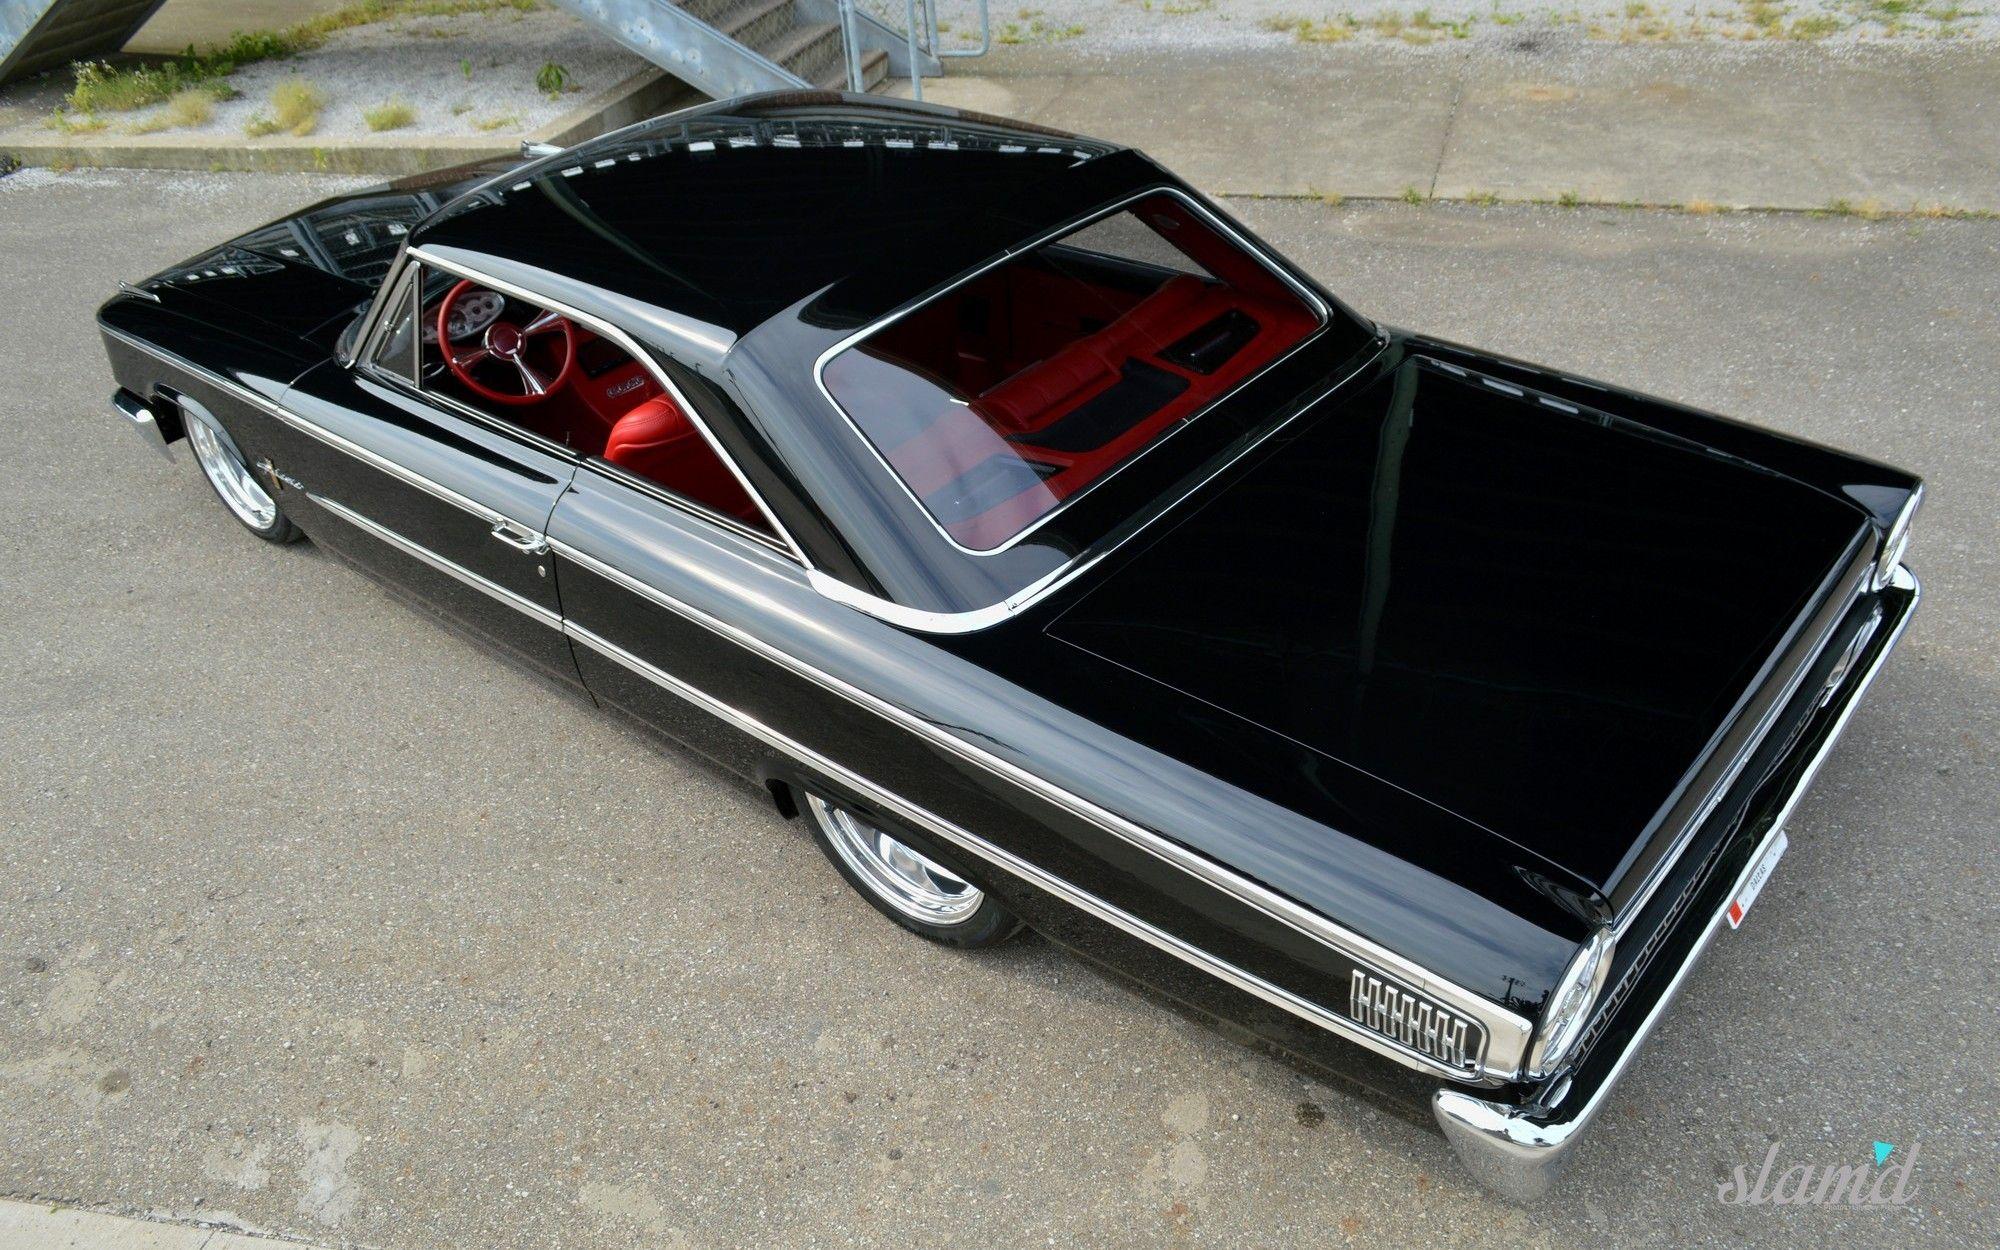 Black Beauty Mark Stuchel S 1963 1 2 Ford Galaxie Ford Galaxie